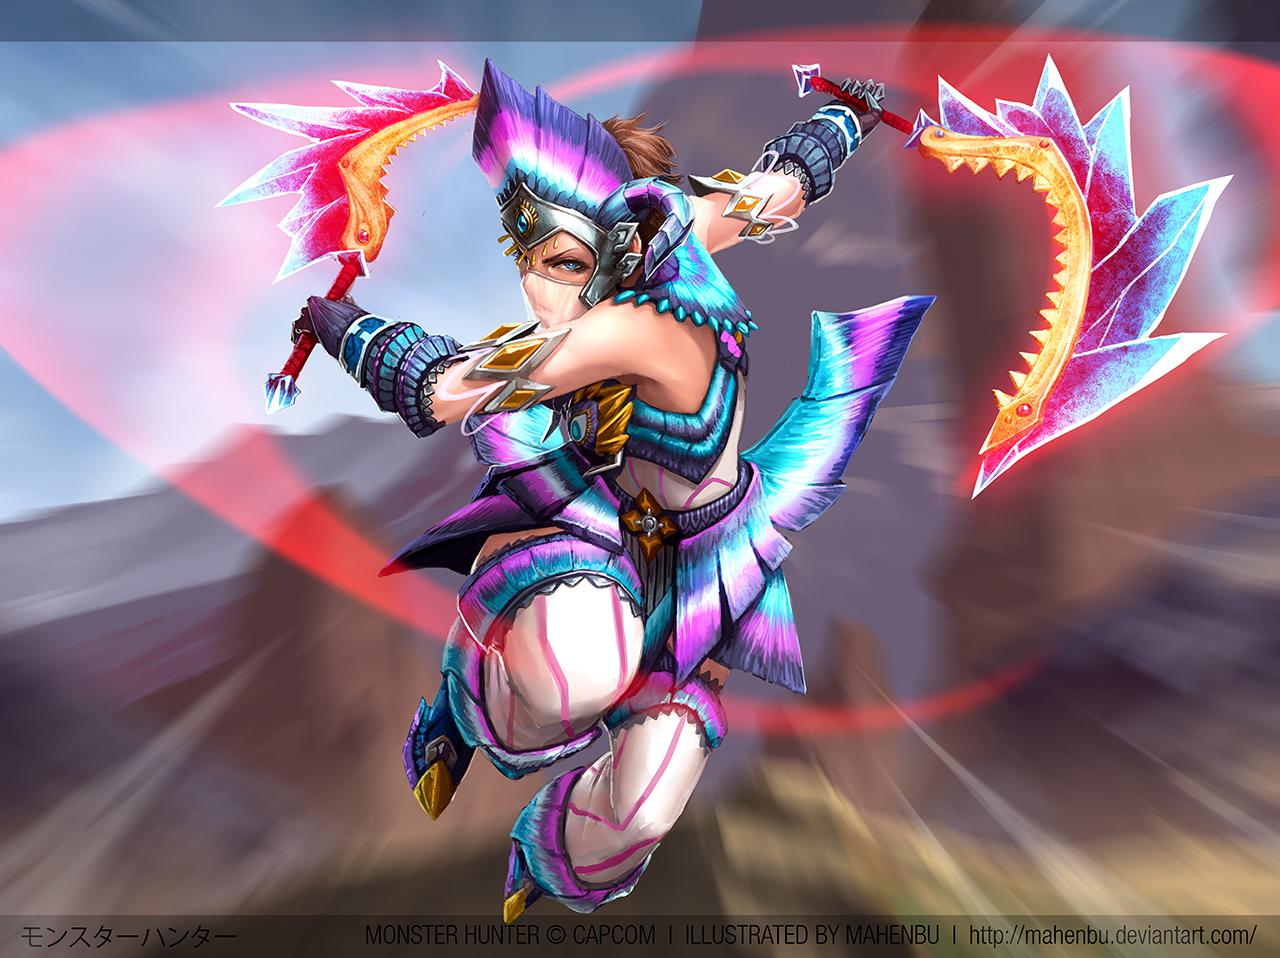 Monster Hunter 4 Ultimate By Mahenbu On Deviantart